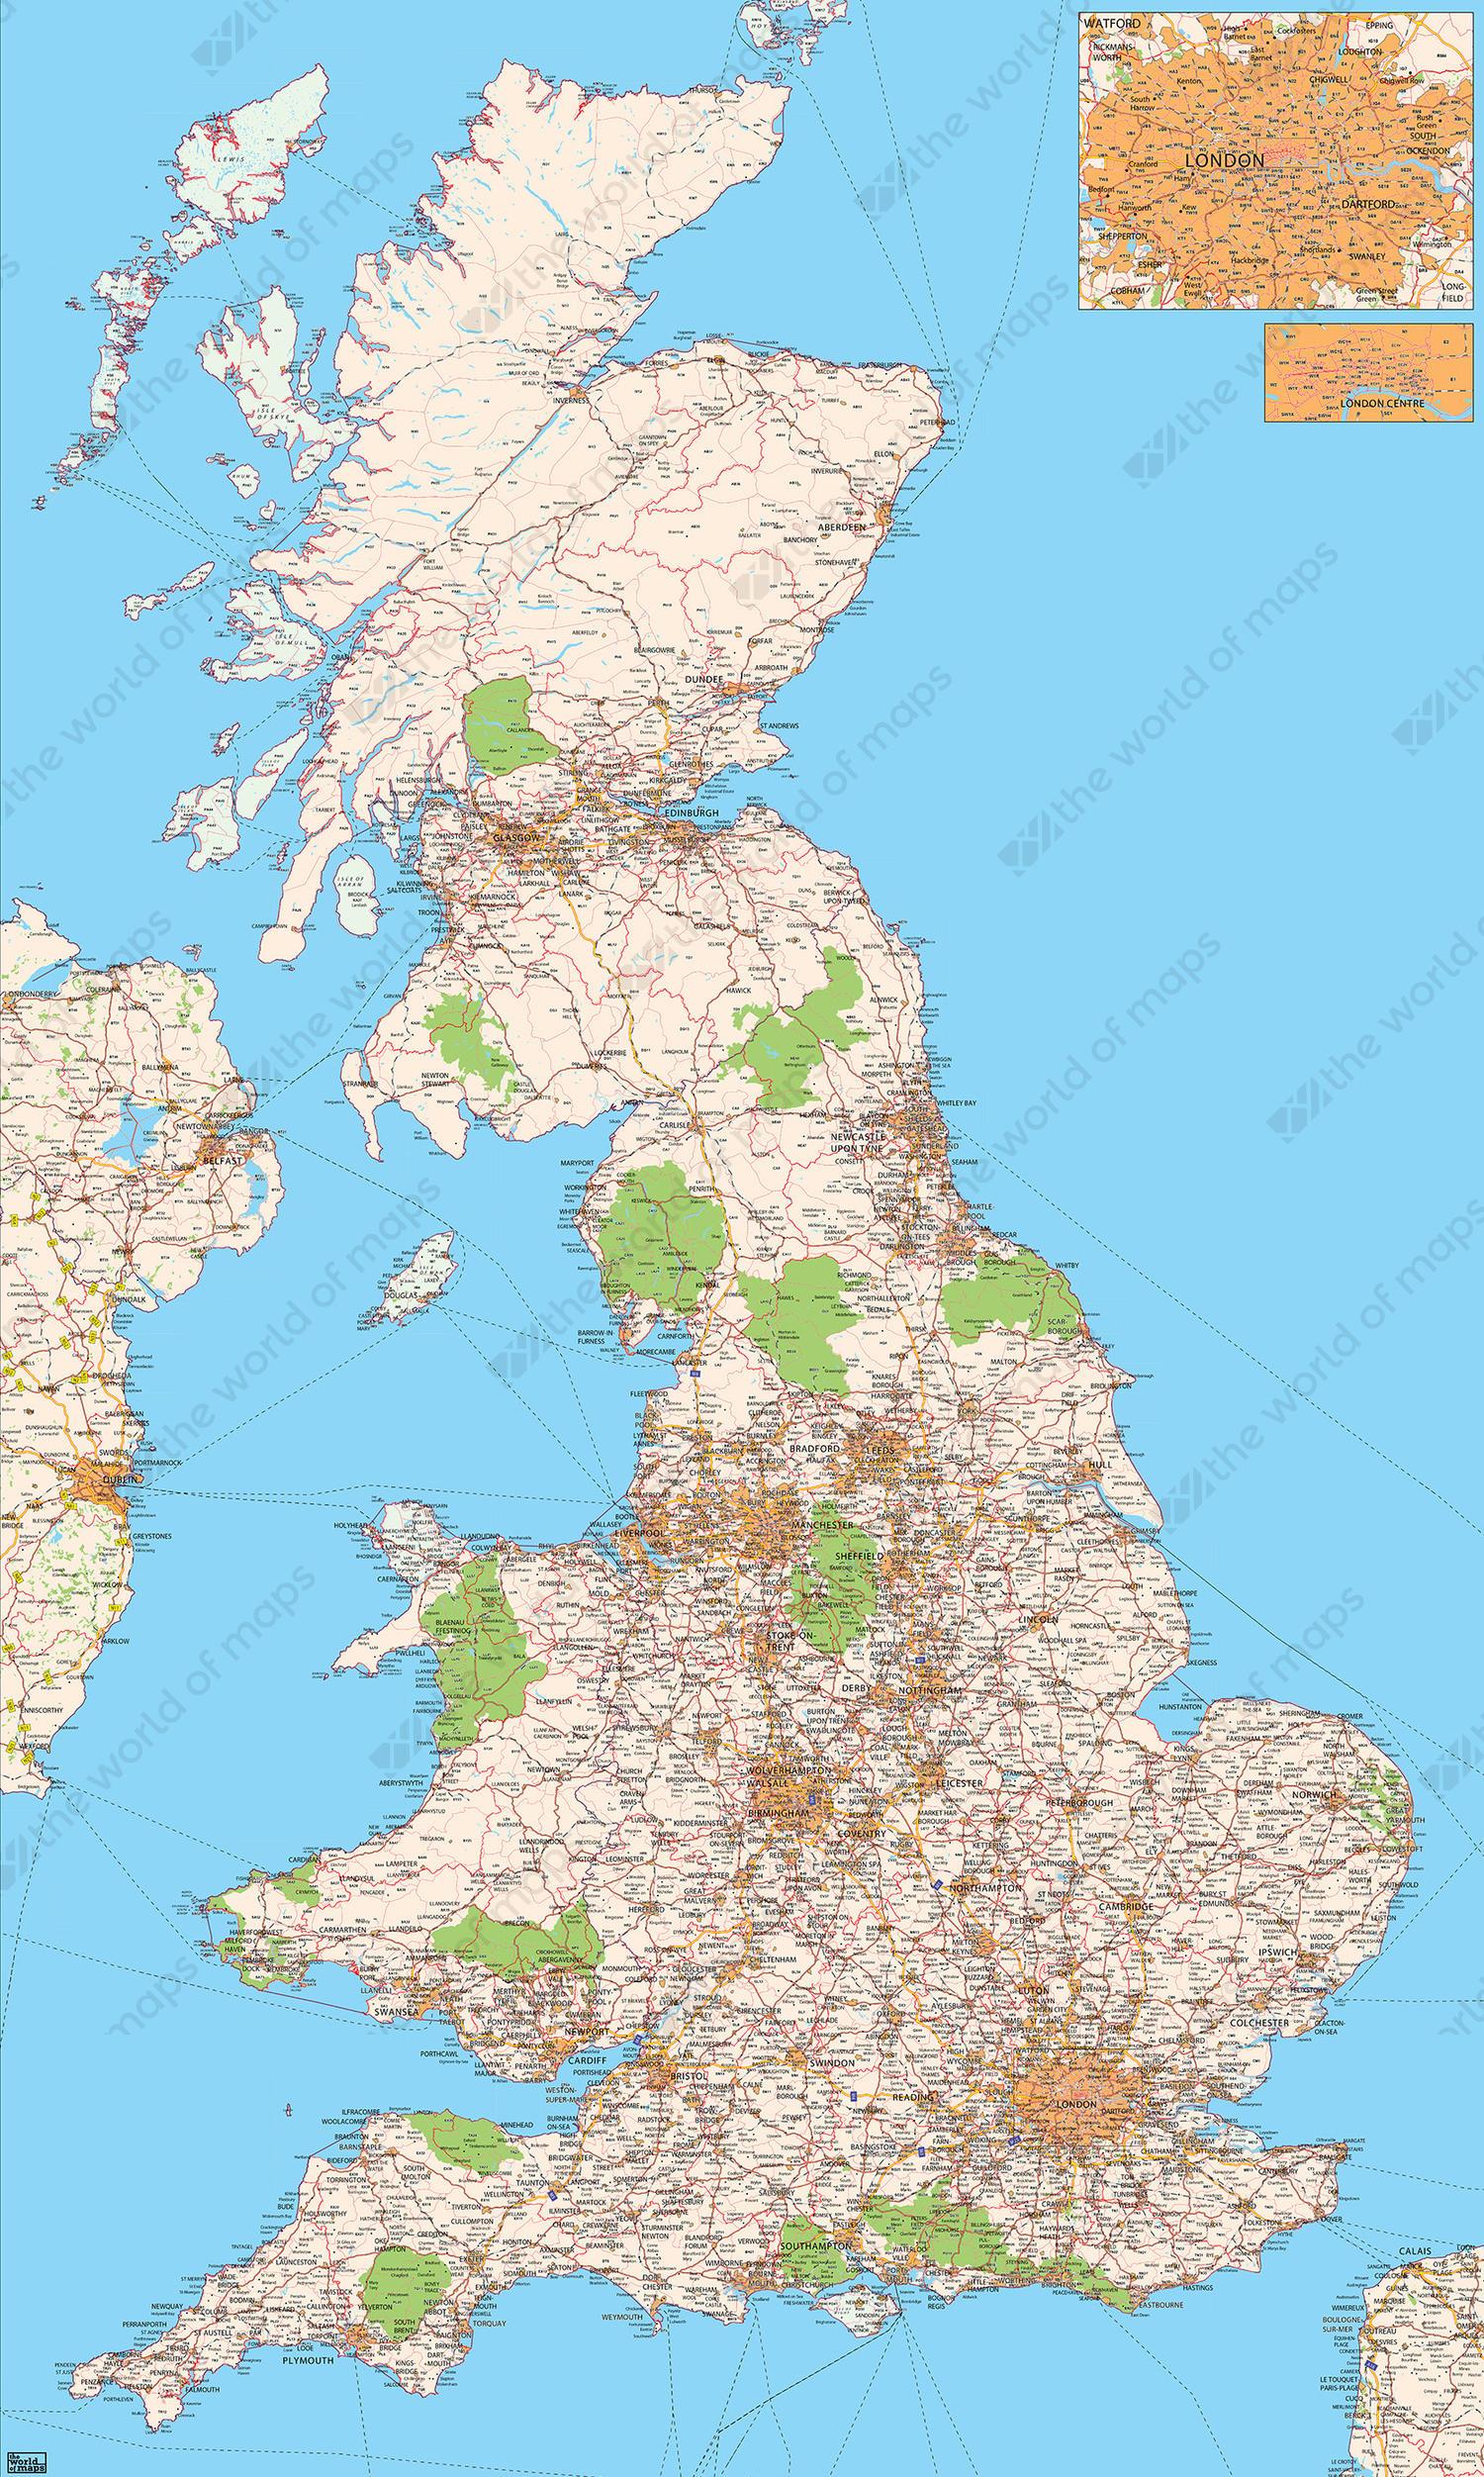 Digital Postal Code Map United Kingdom The World Of Mapscom - United kingdom clickable map